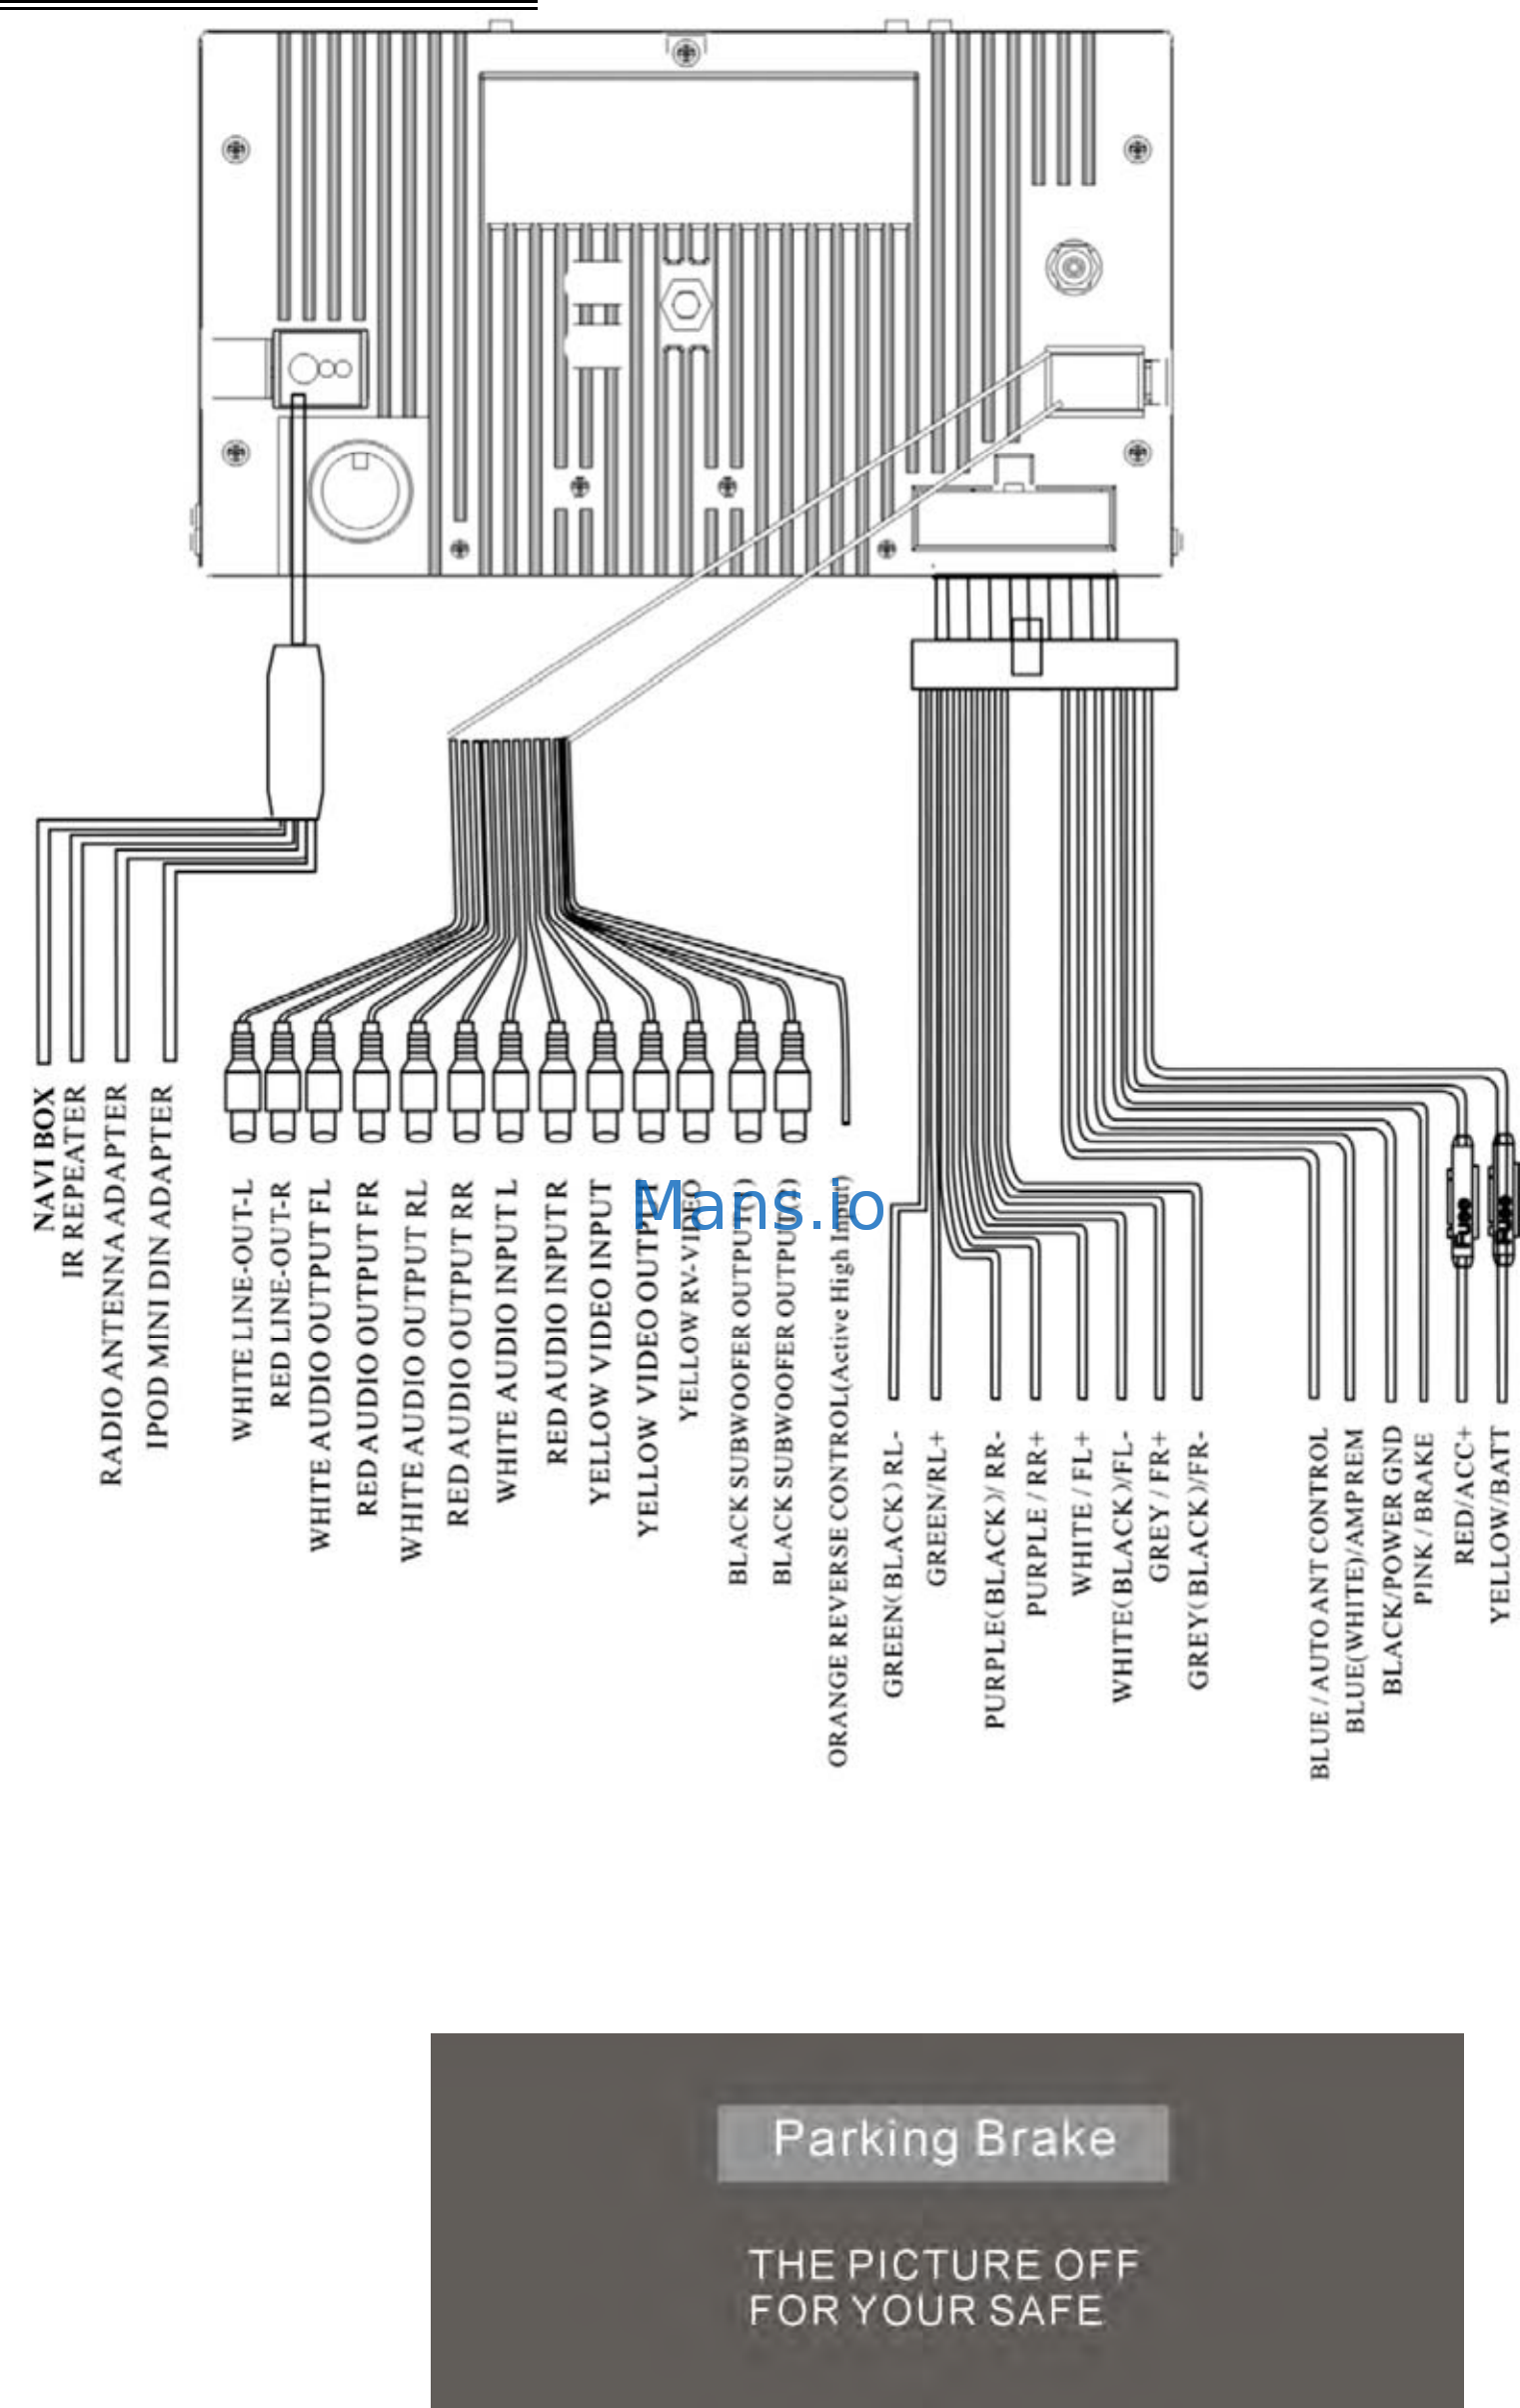 Power Acoustik Pdn-626B Wiring Diagram from schematron.org